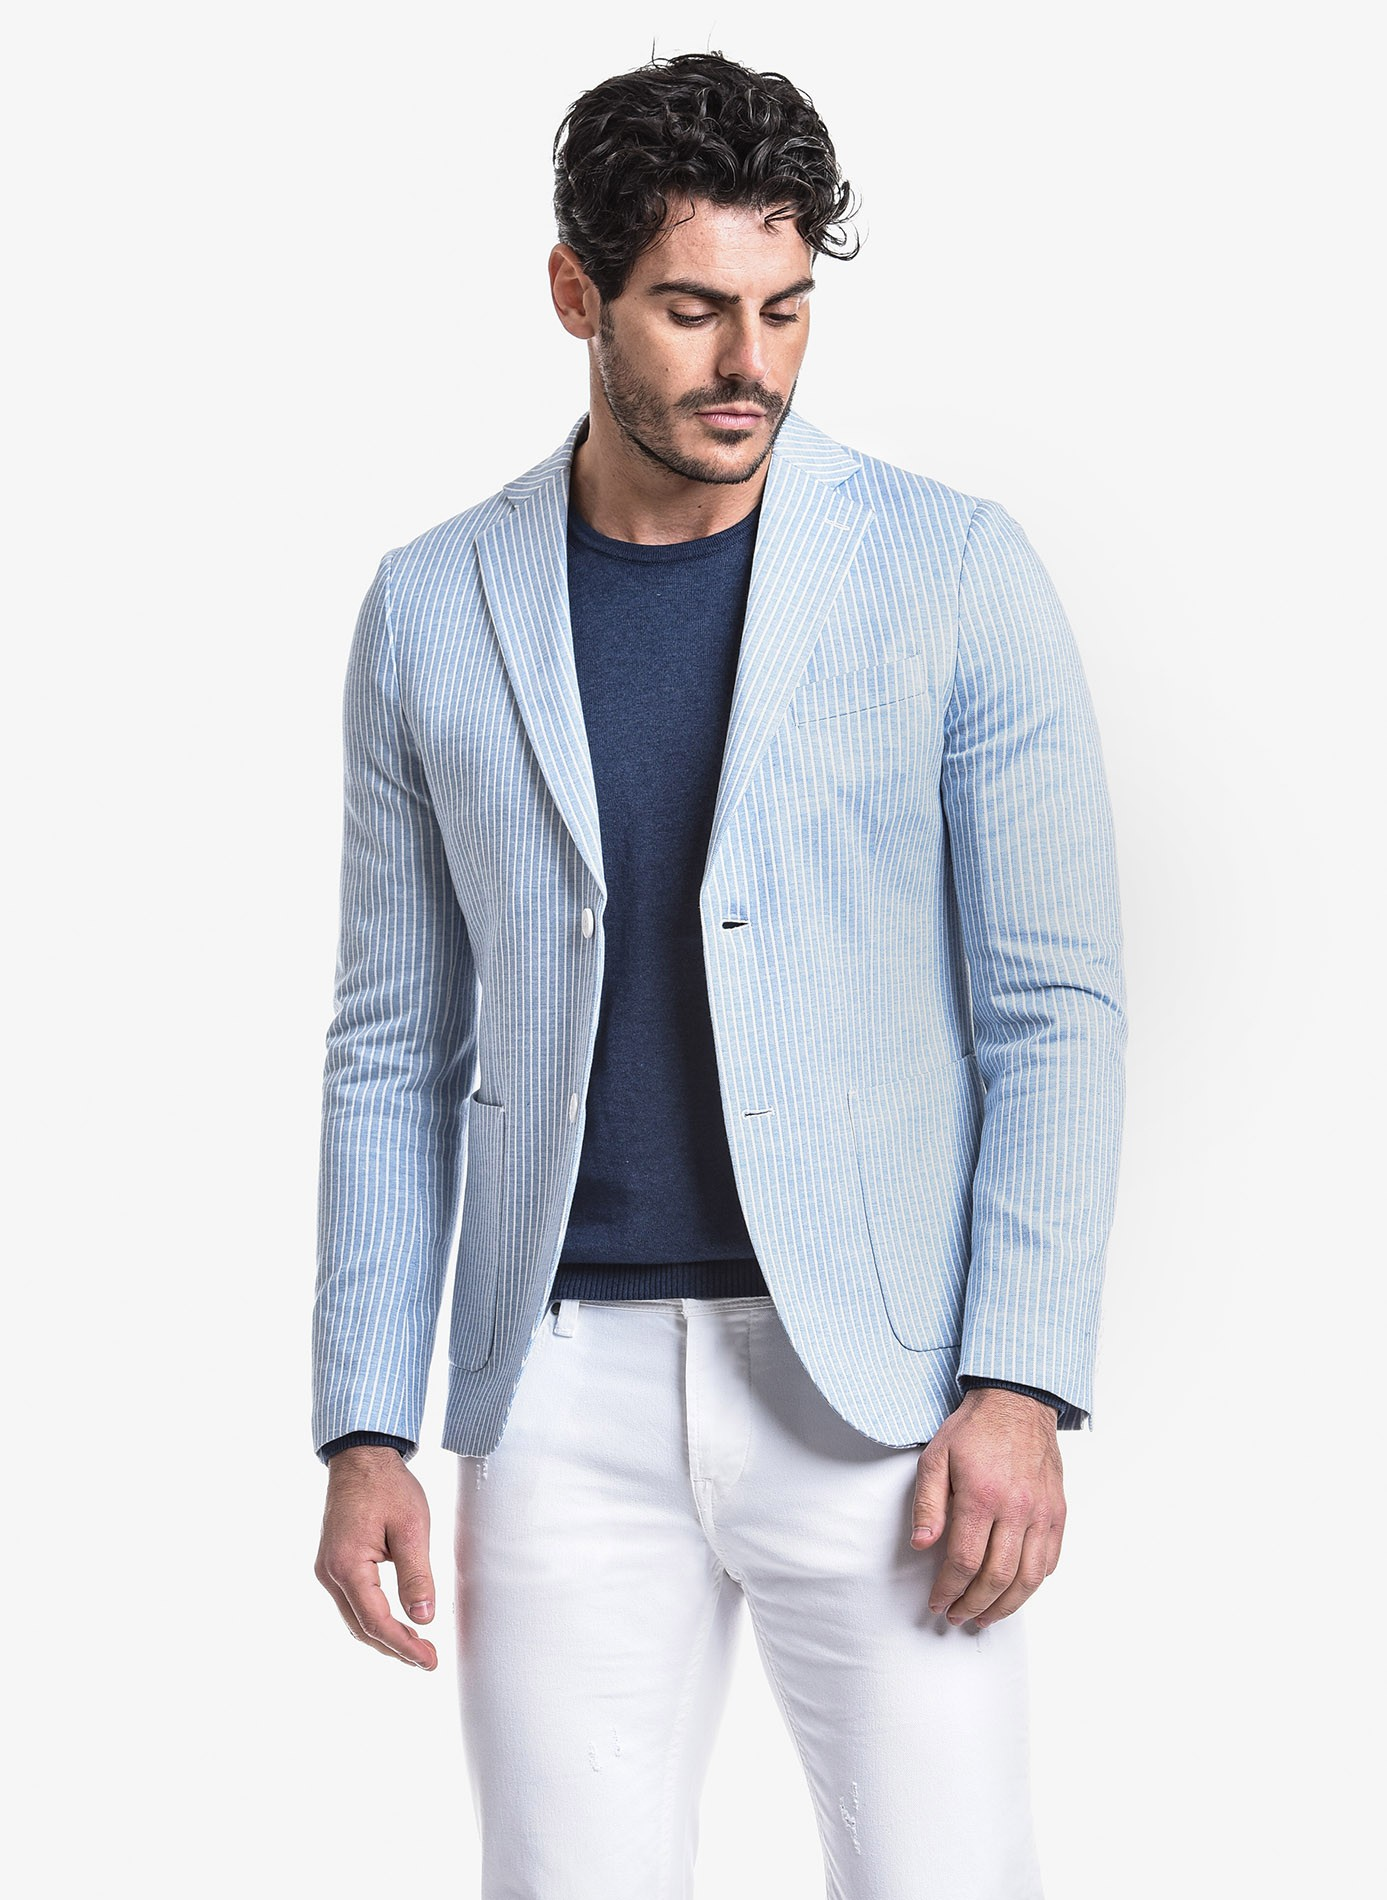 a0592f99d88db John Barritt man jacket